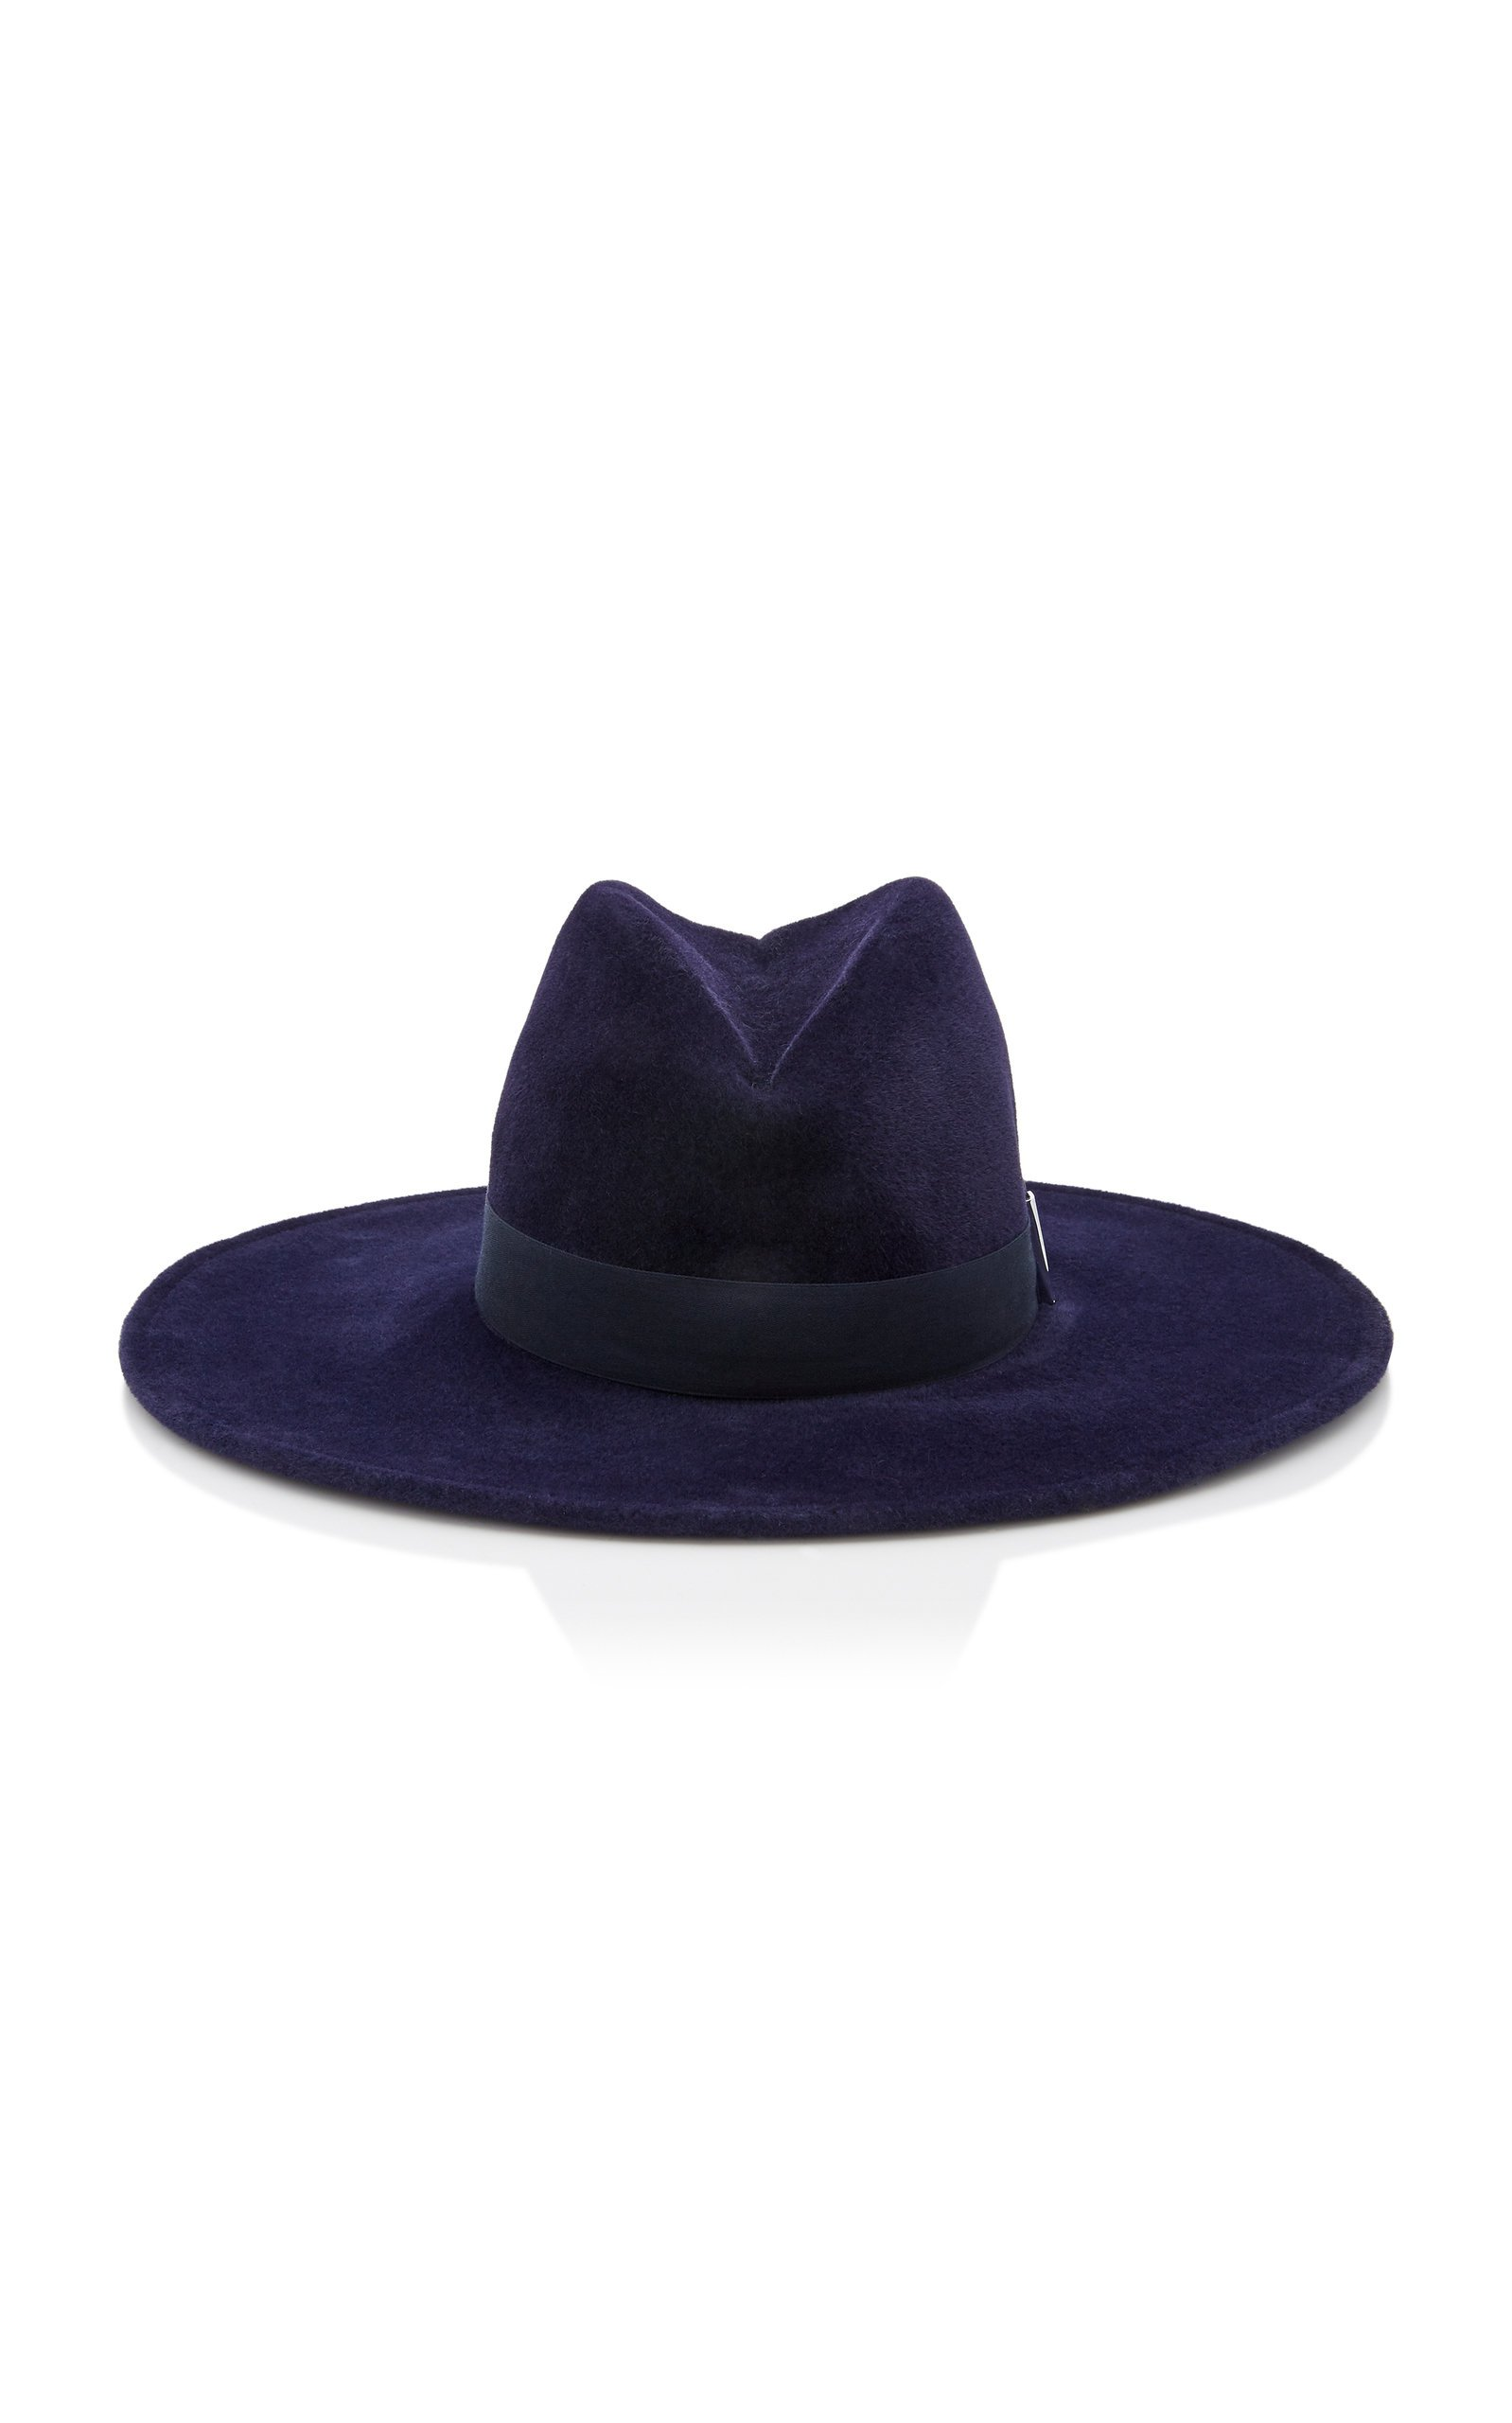 Gigi Burris Moda Exclusive Jeanne Rabbit-Felt Hat Size: M